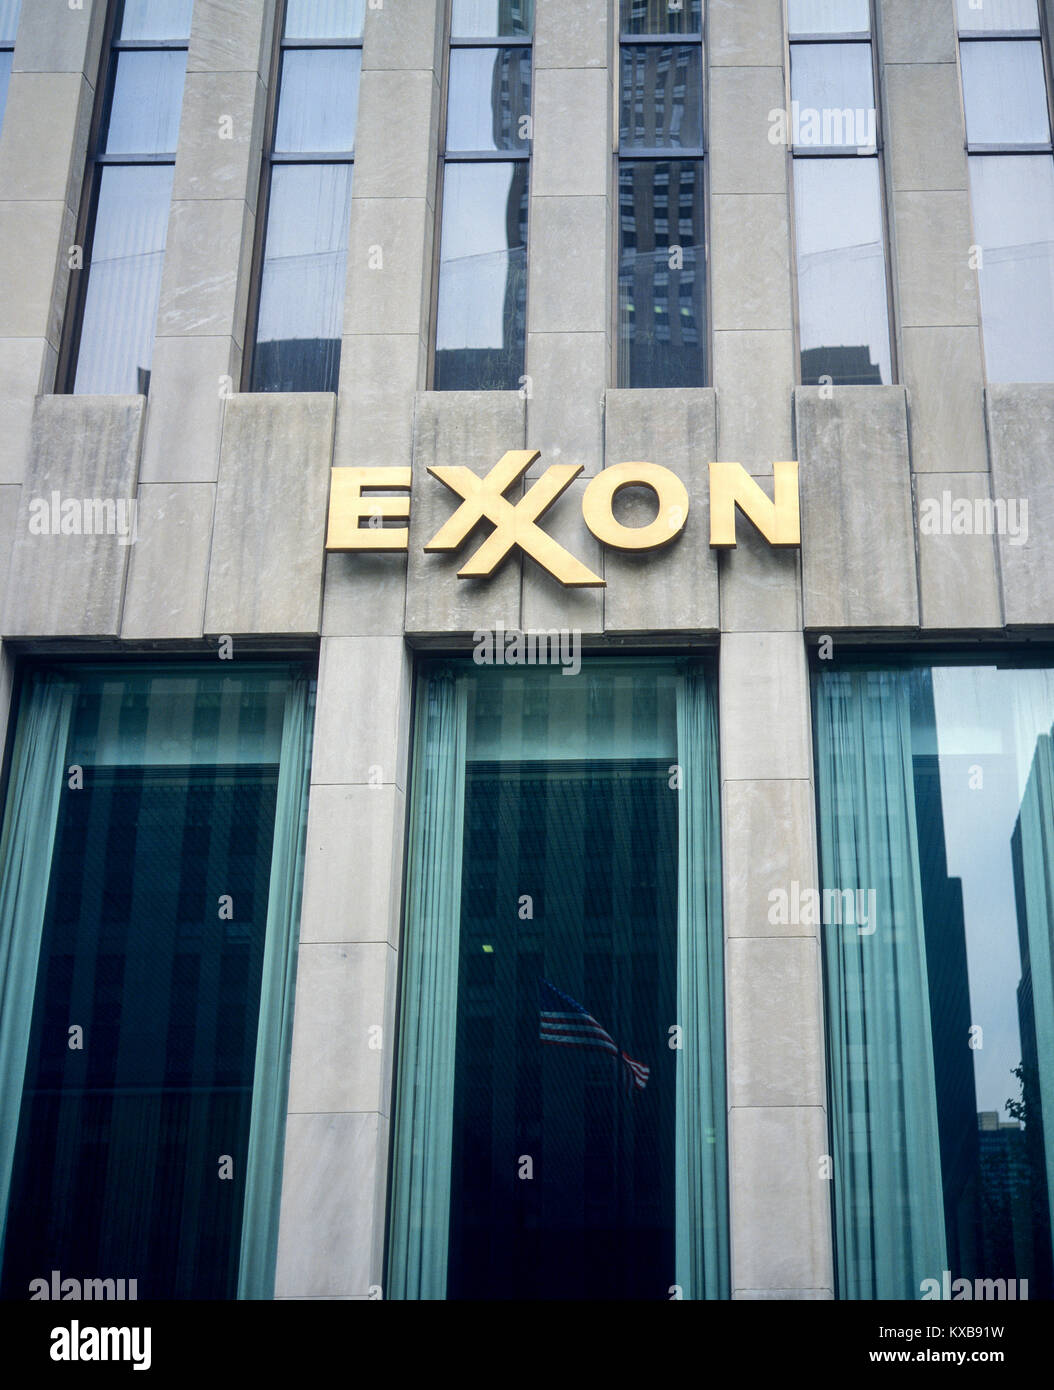 Mai 1982, New York, Exxon Building, 1251 Avenue of the Americas, Sixth Avenue, Manhattan, New York City, NY, NEW Stockbild